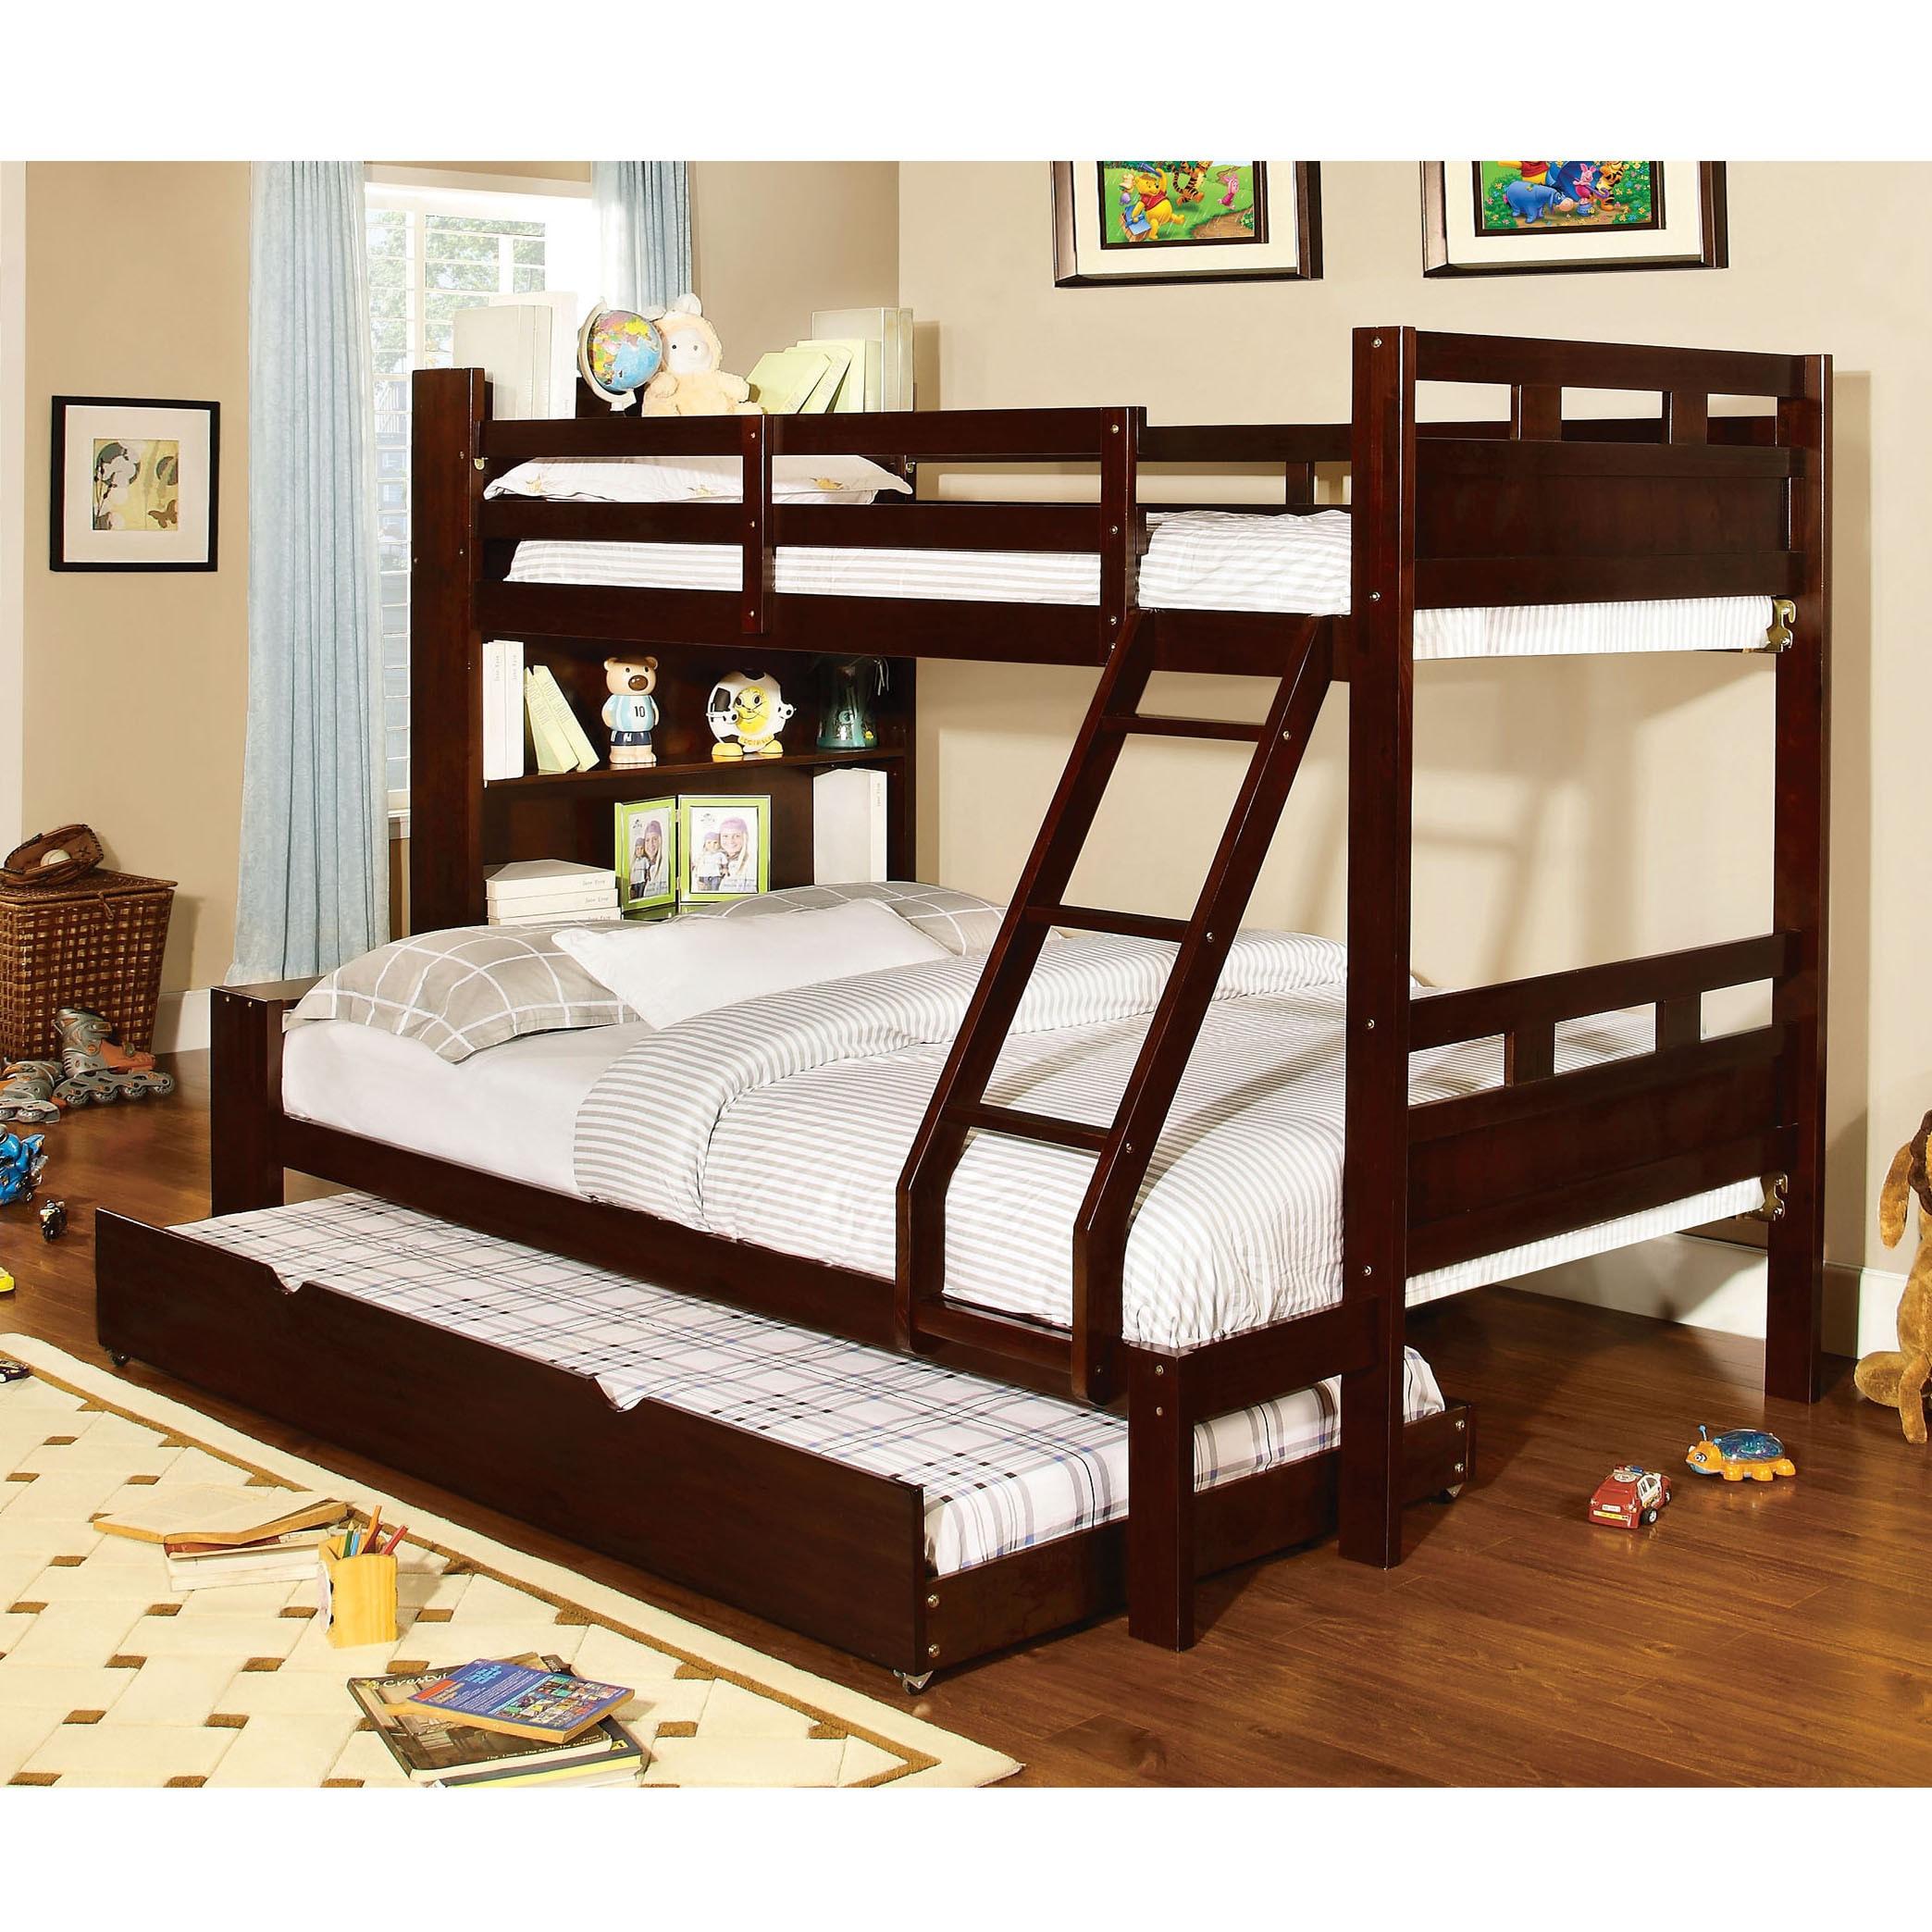 Furniture of America Chessin Dark Walnut Bunk Bed with Bu...